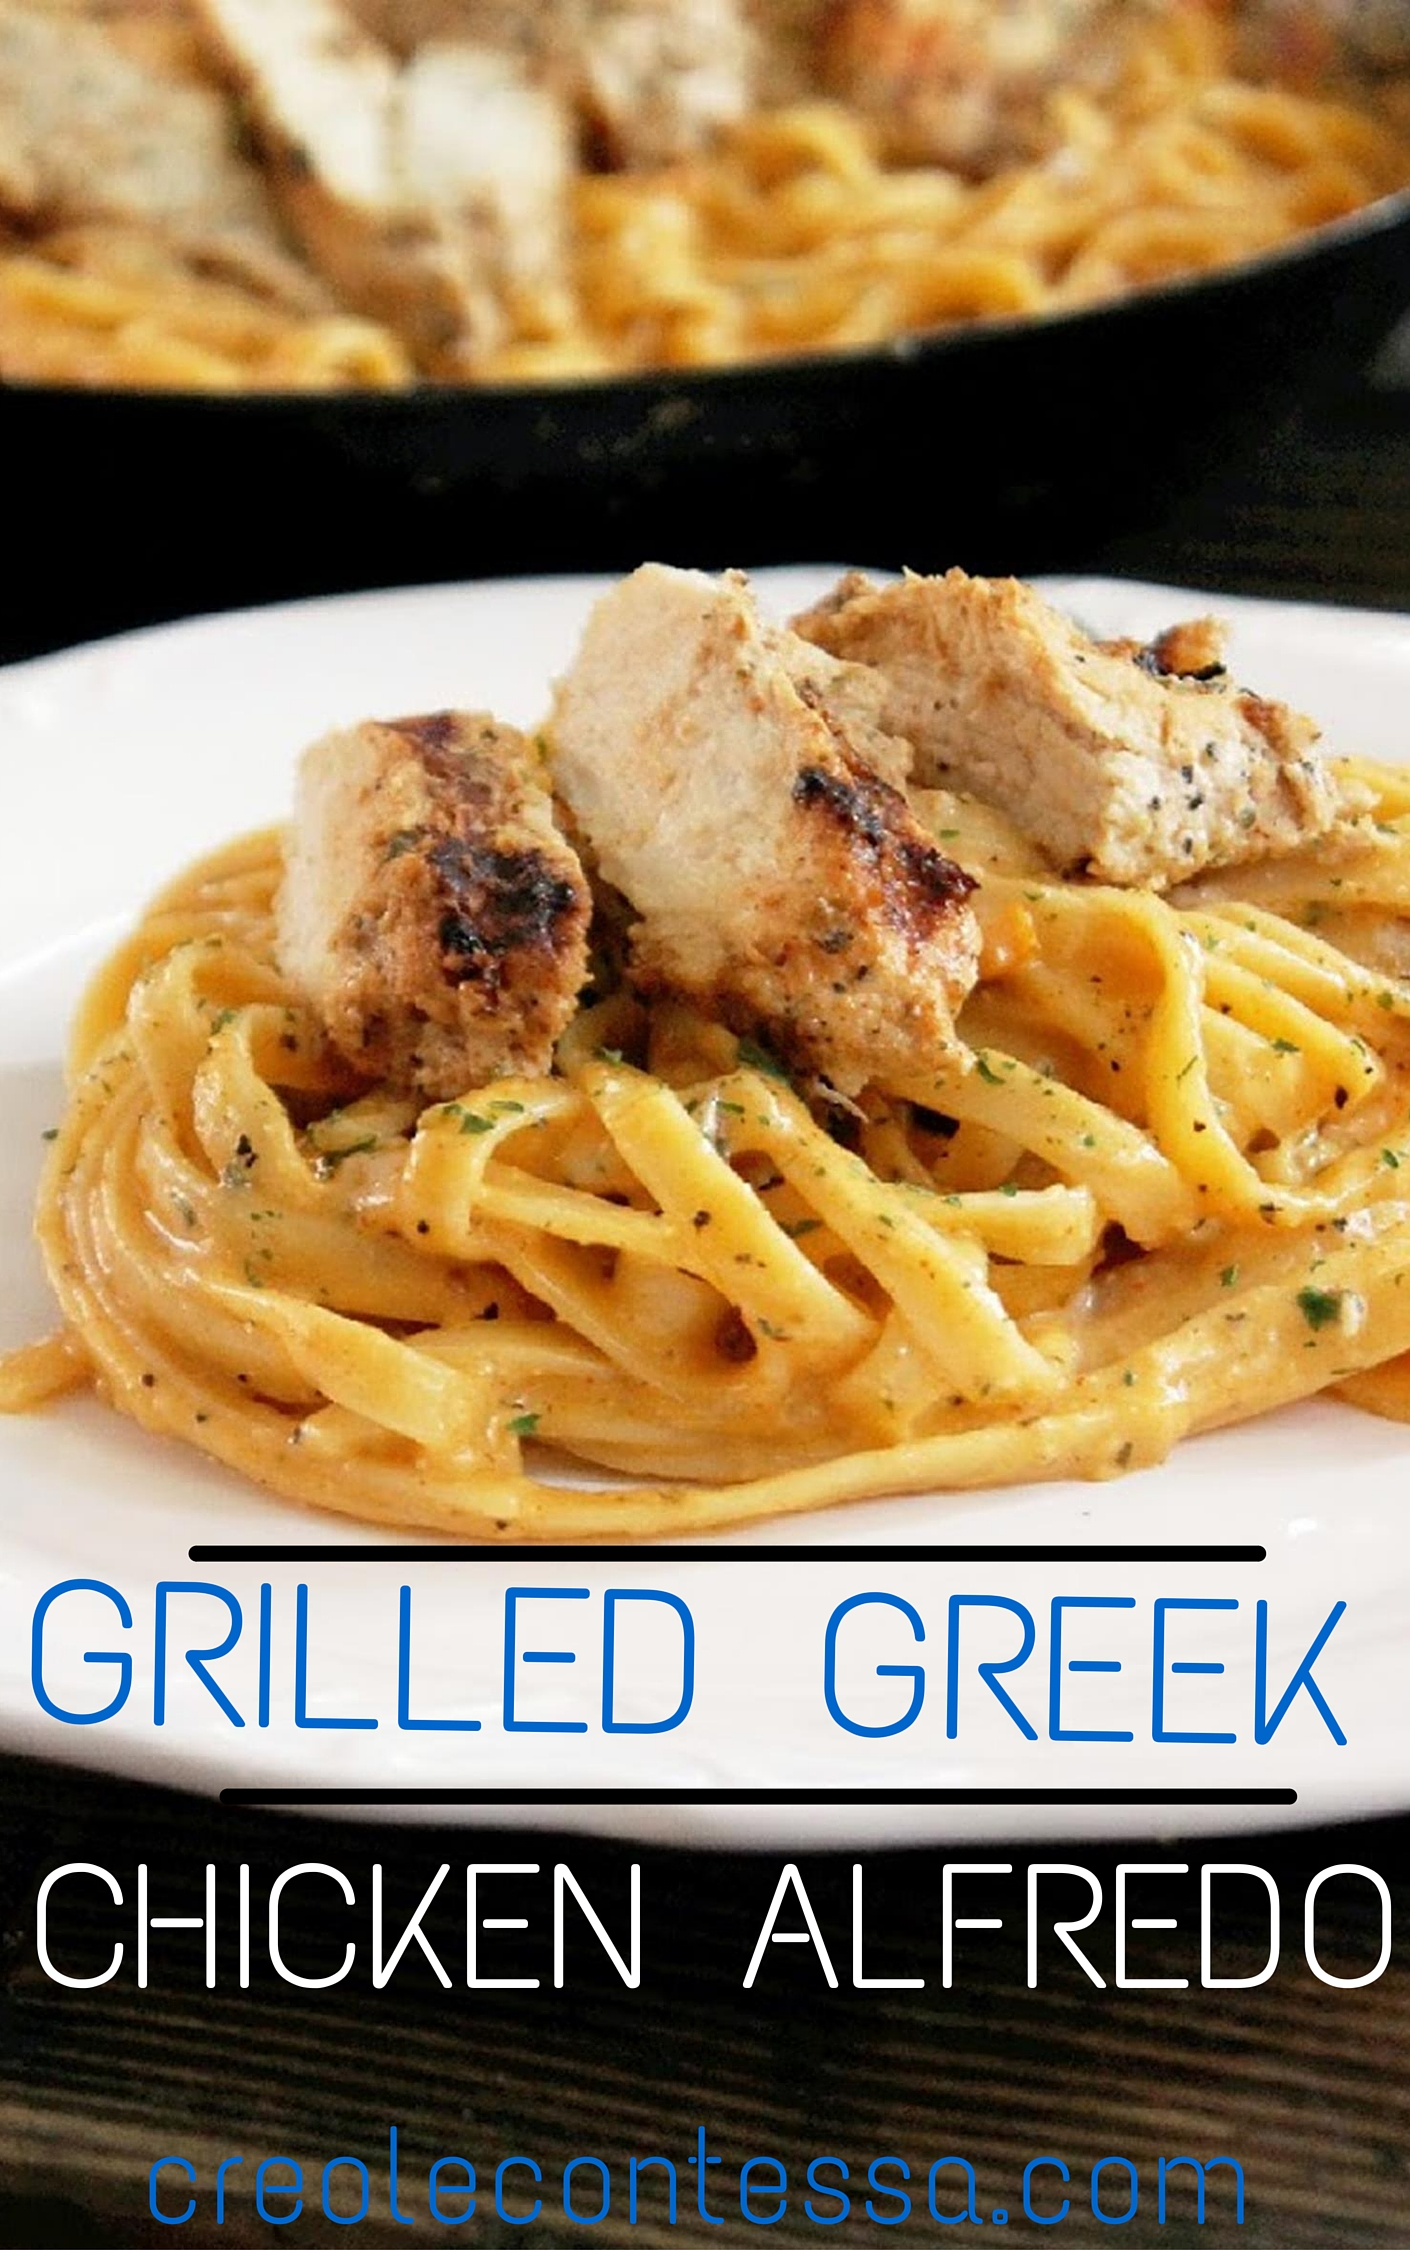 Grilled Greek Chicken Alfredo-Creole Contessa